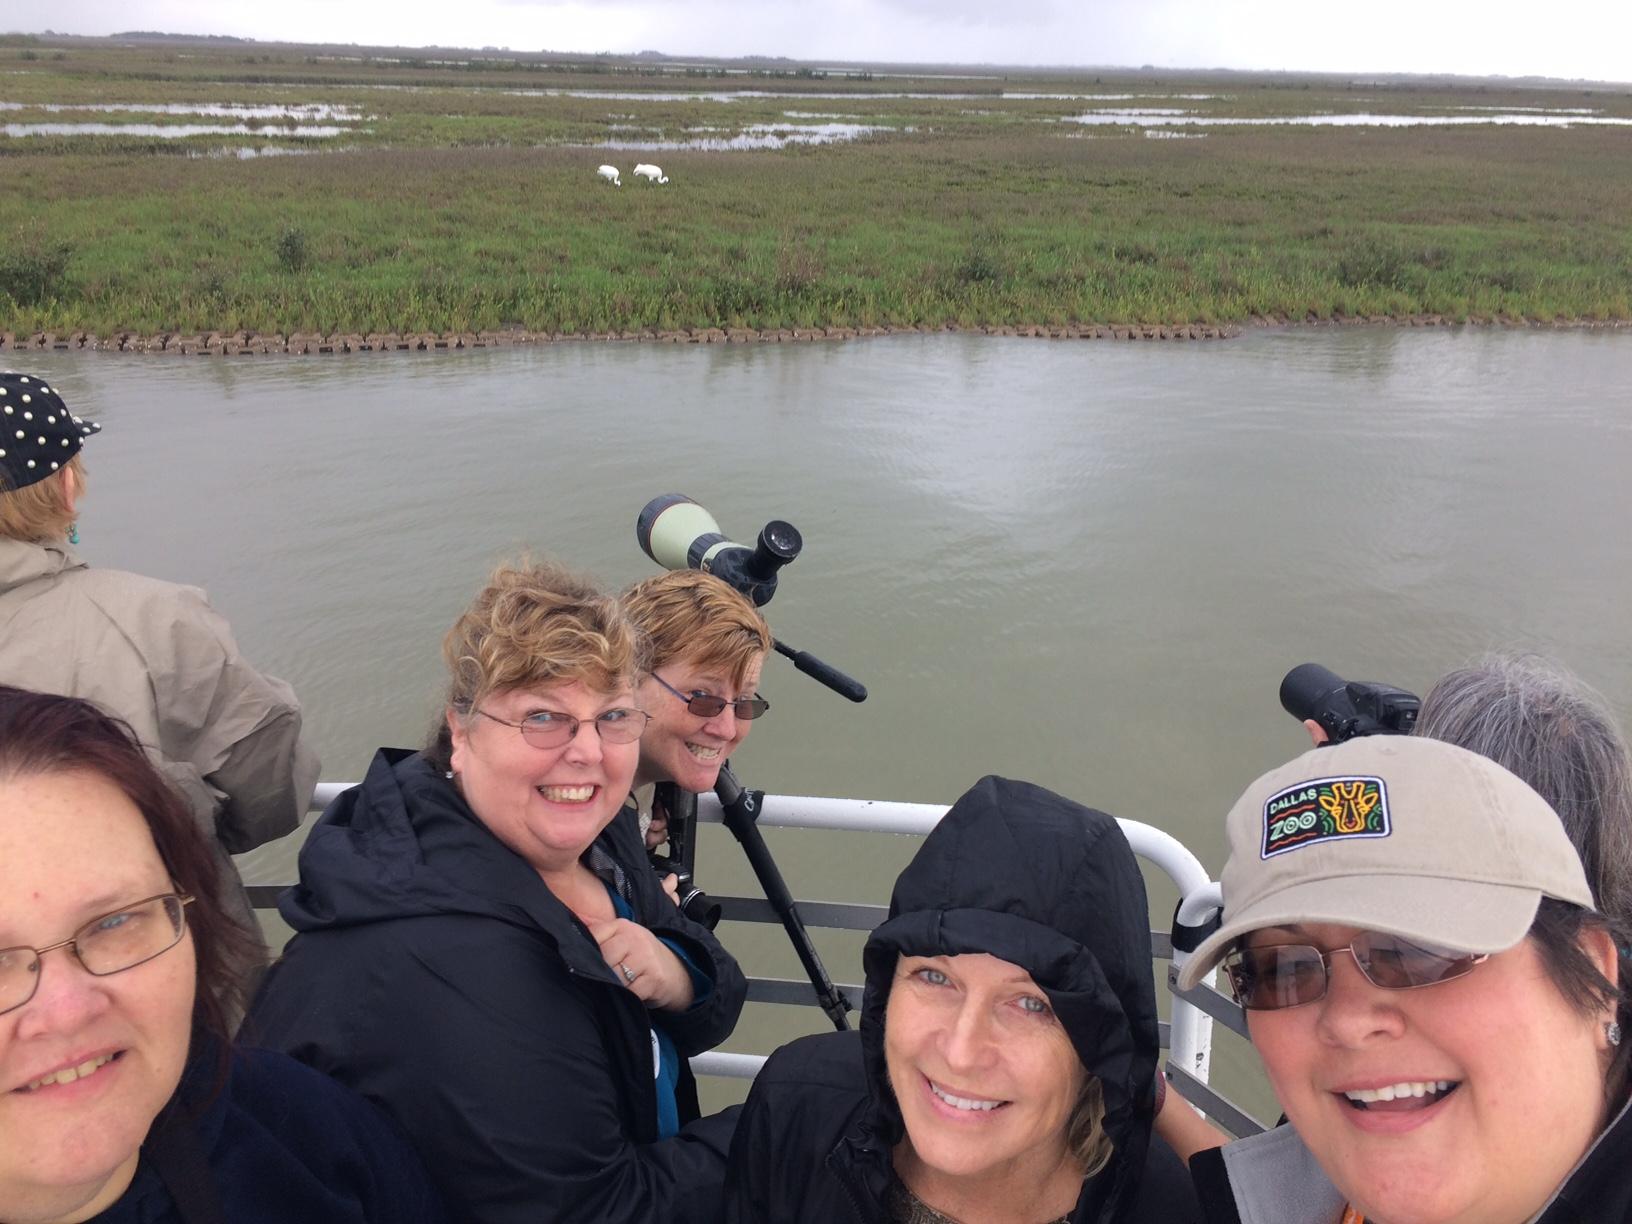 The team observes the endangered whooping crane in the Aransas National Wildlife Refuge